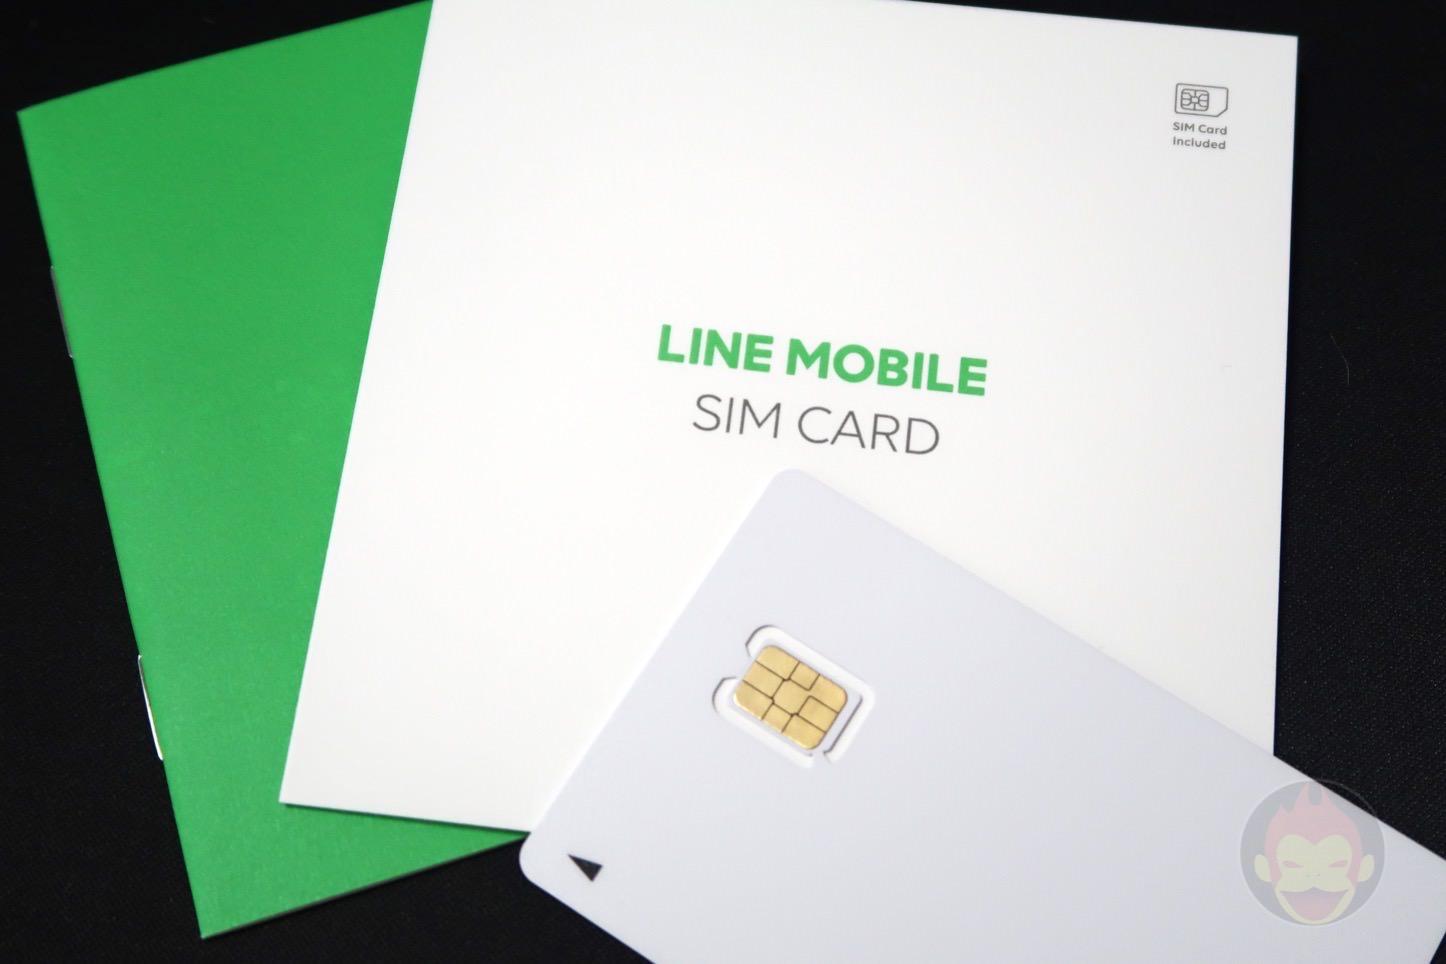 LINE MOBILE SIM card 01